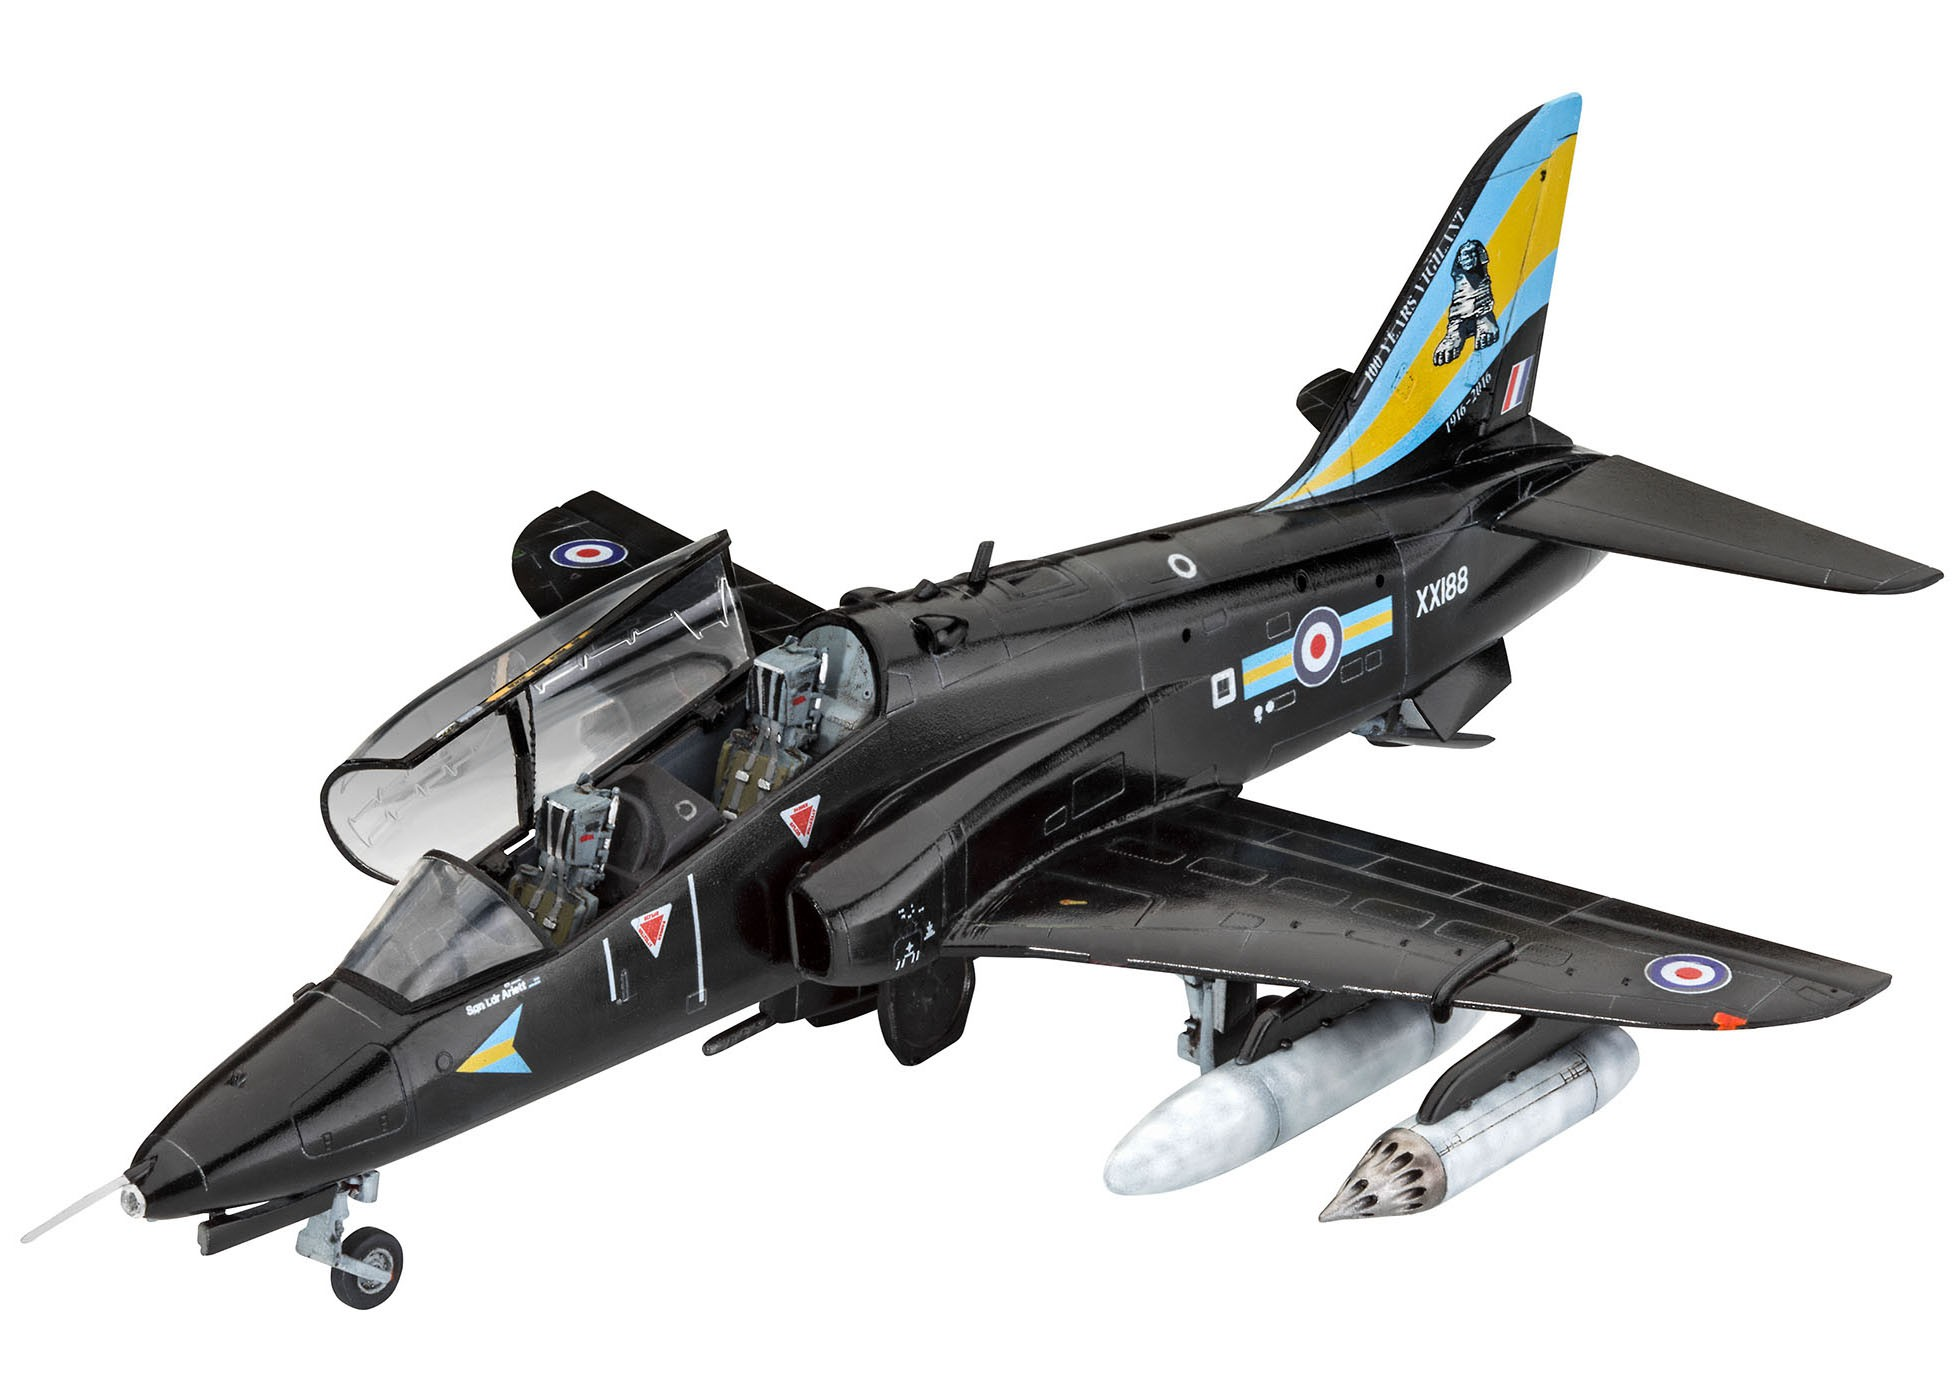 BAe Hawk T.1 - 1/72 - Revell 04970  - BLIMPS COMÉRCIO ELETRÔNICO